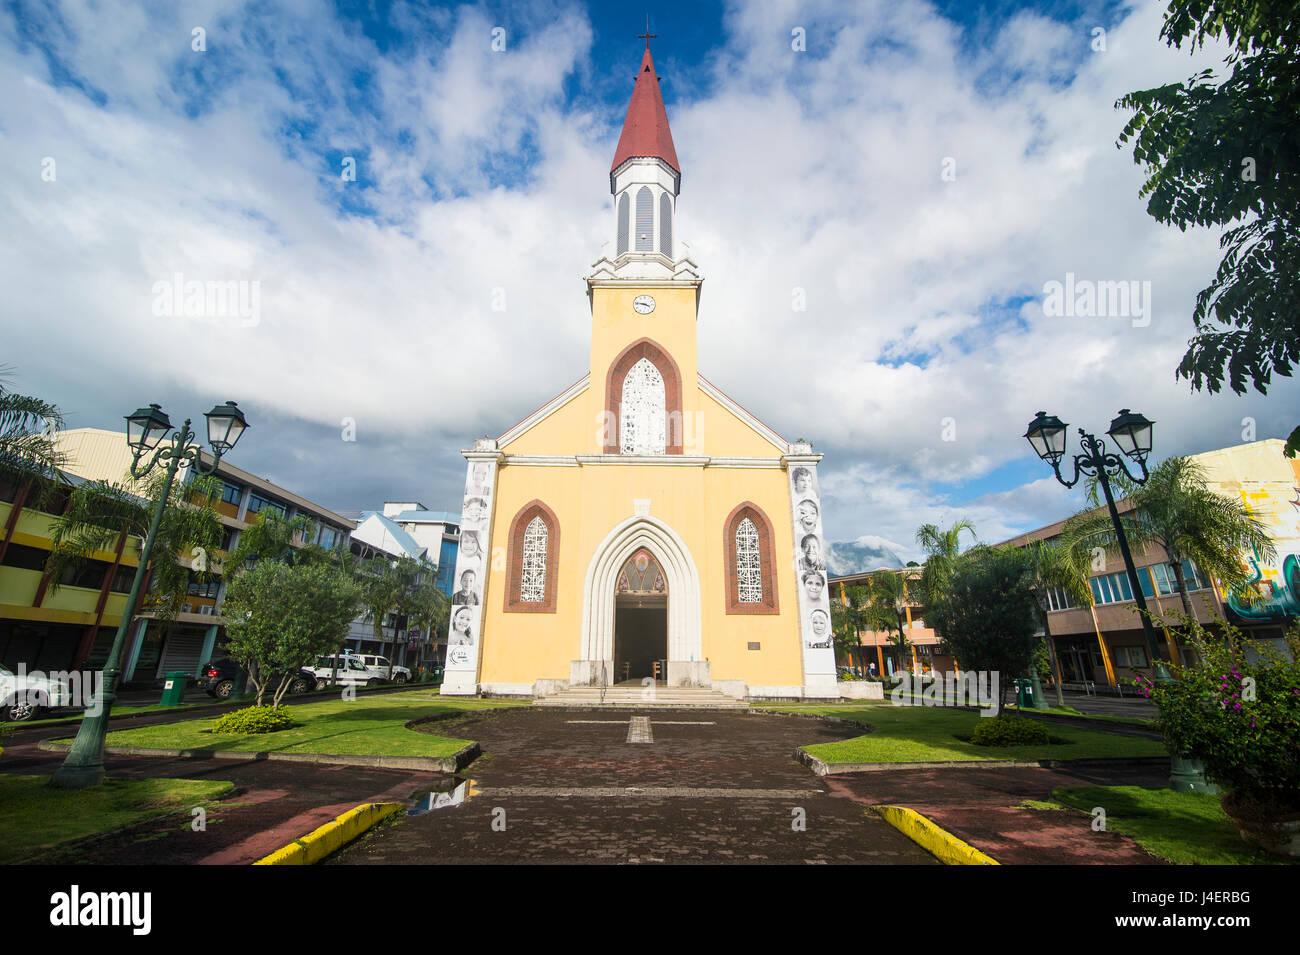 Roman Catholic Archdiocese of Papeete, Tahiti, Society Islands, French Polynesia, Pacific - Stock Image